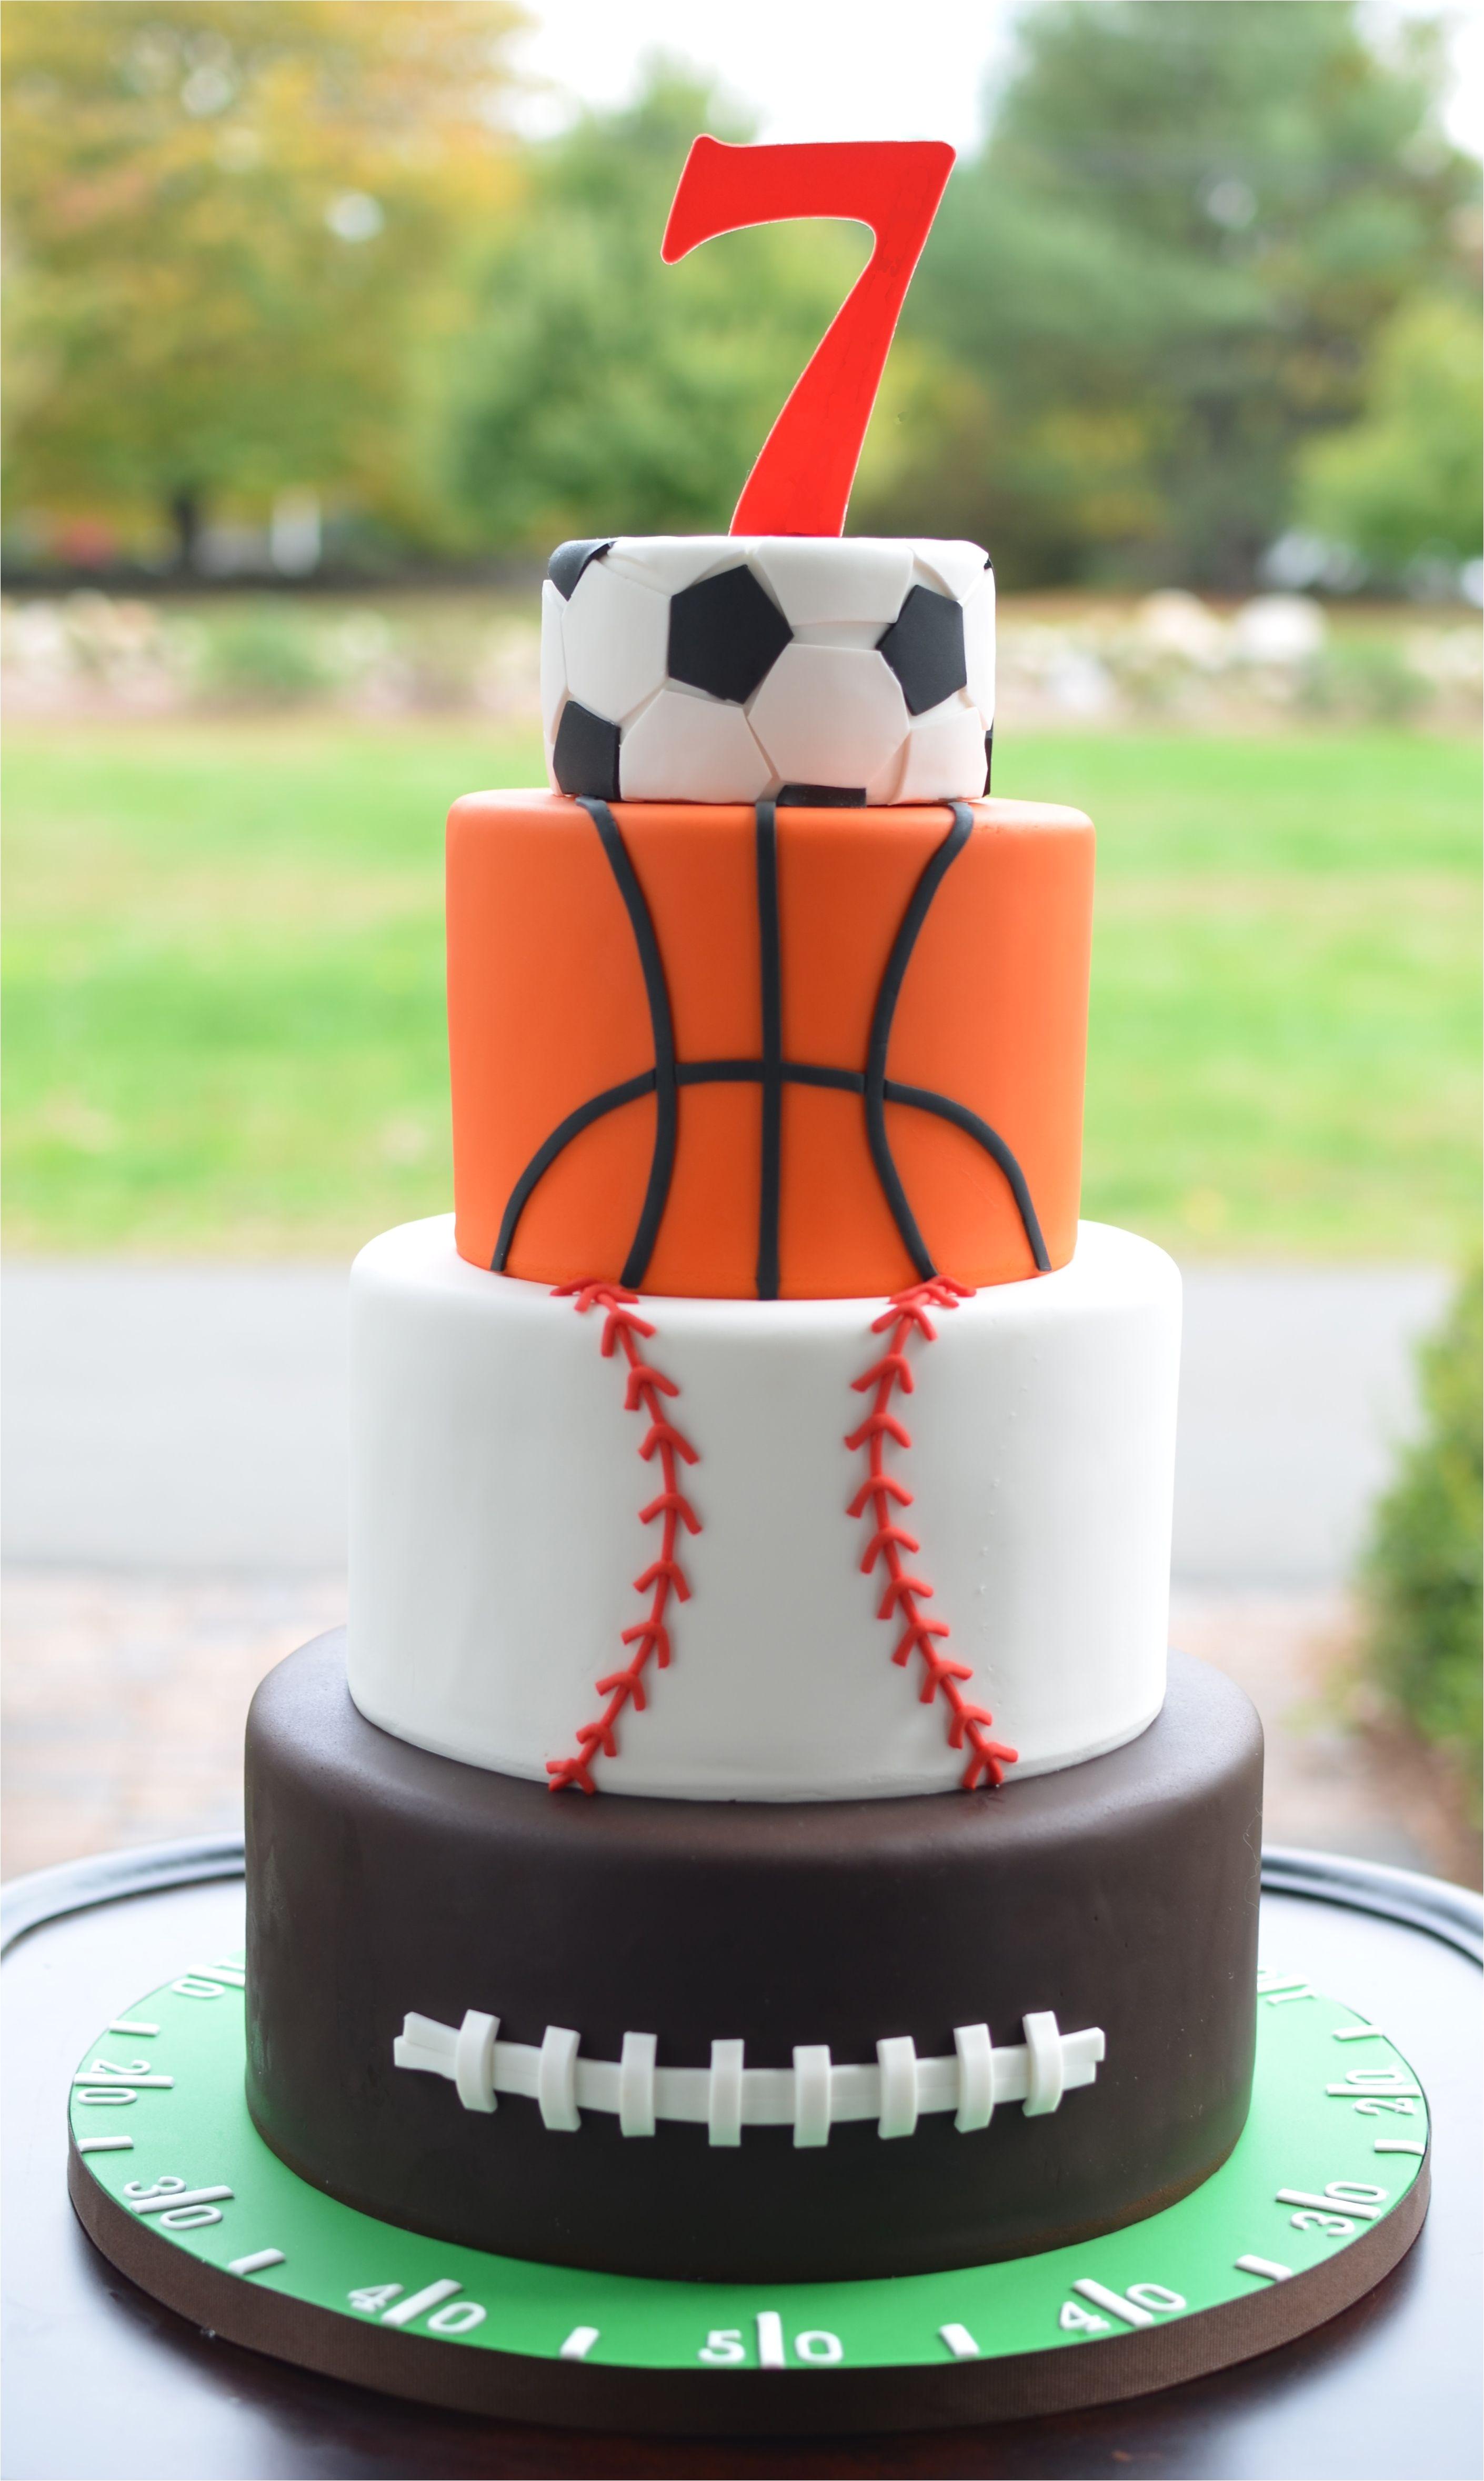 Baseball themed Cake Decorations All Star Sports themed Birthday Cake but A Dream Custom Cakes